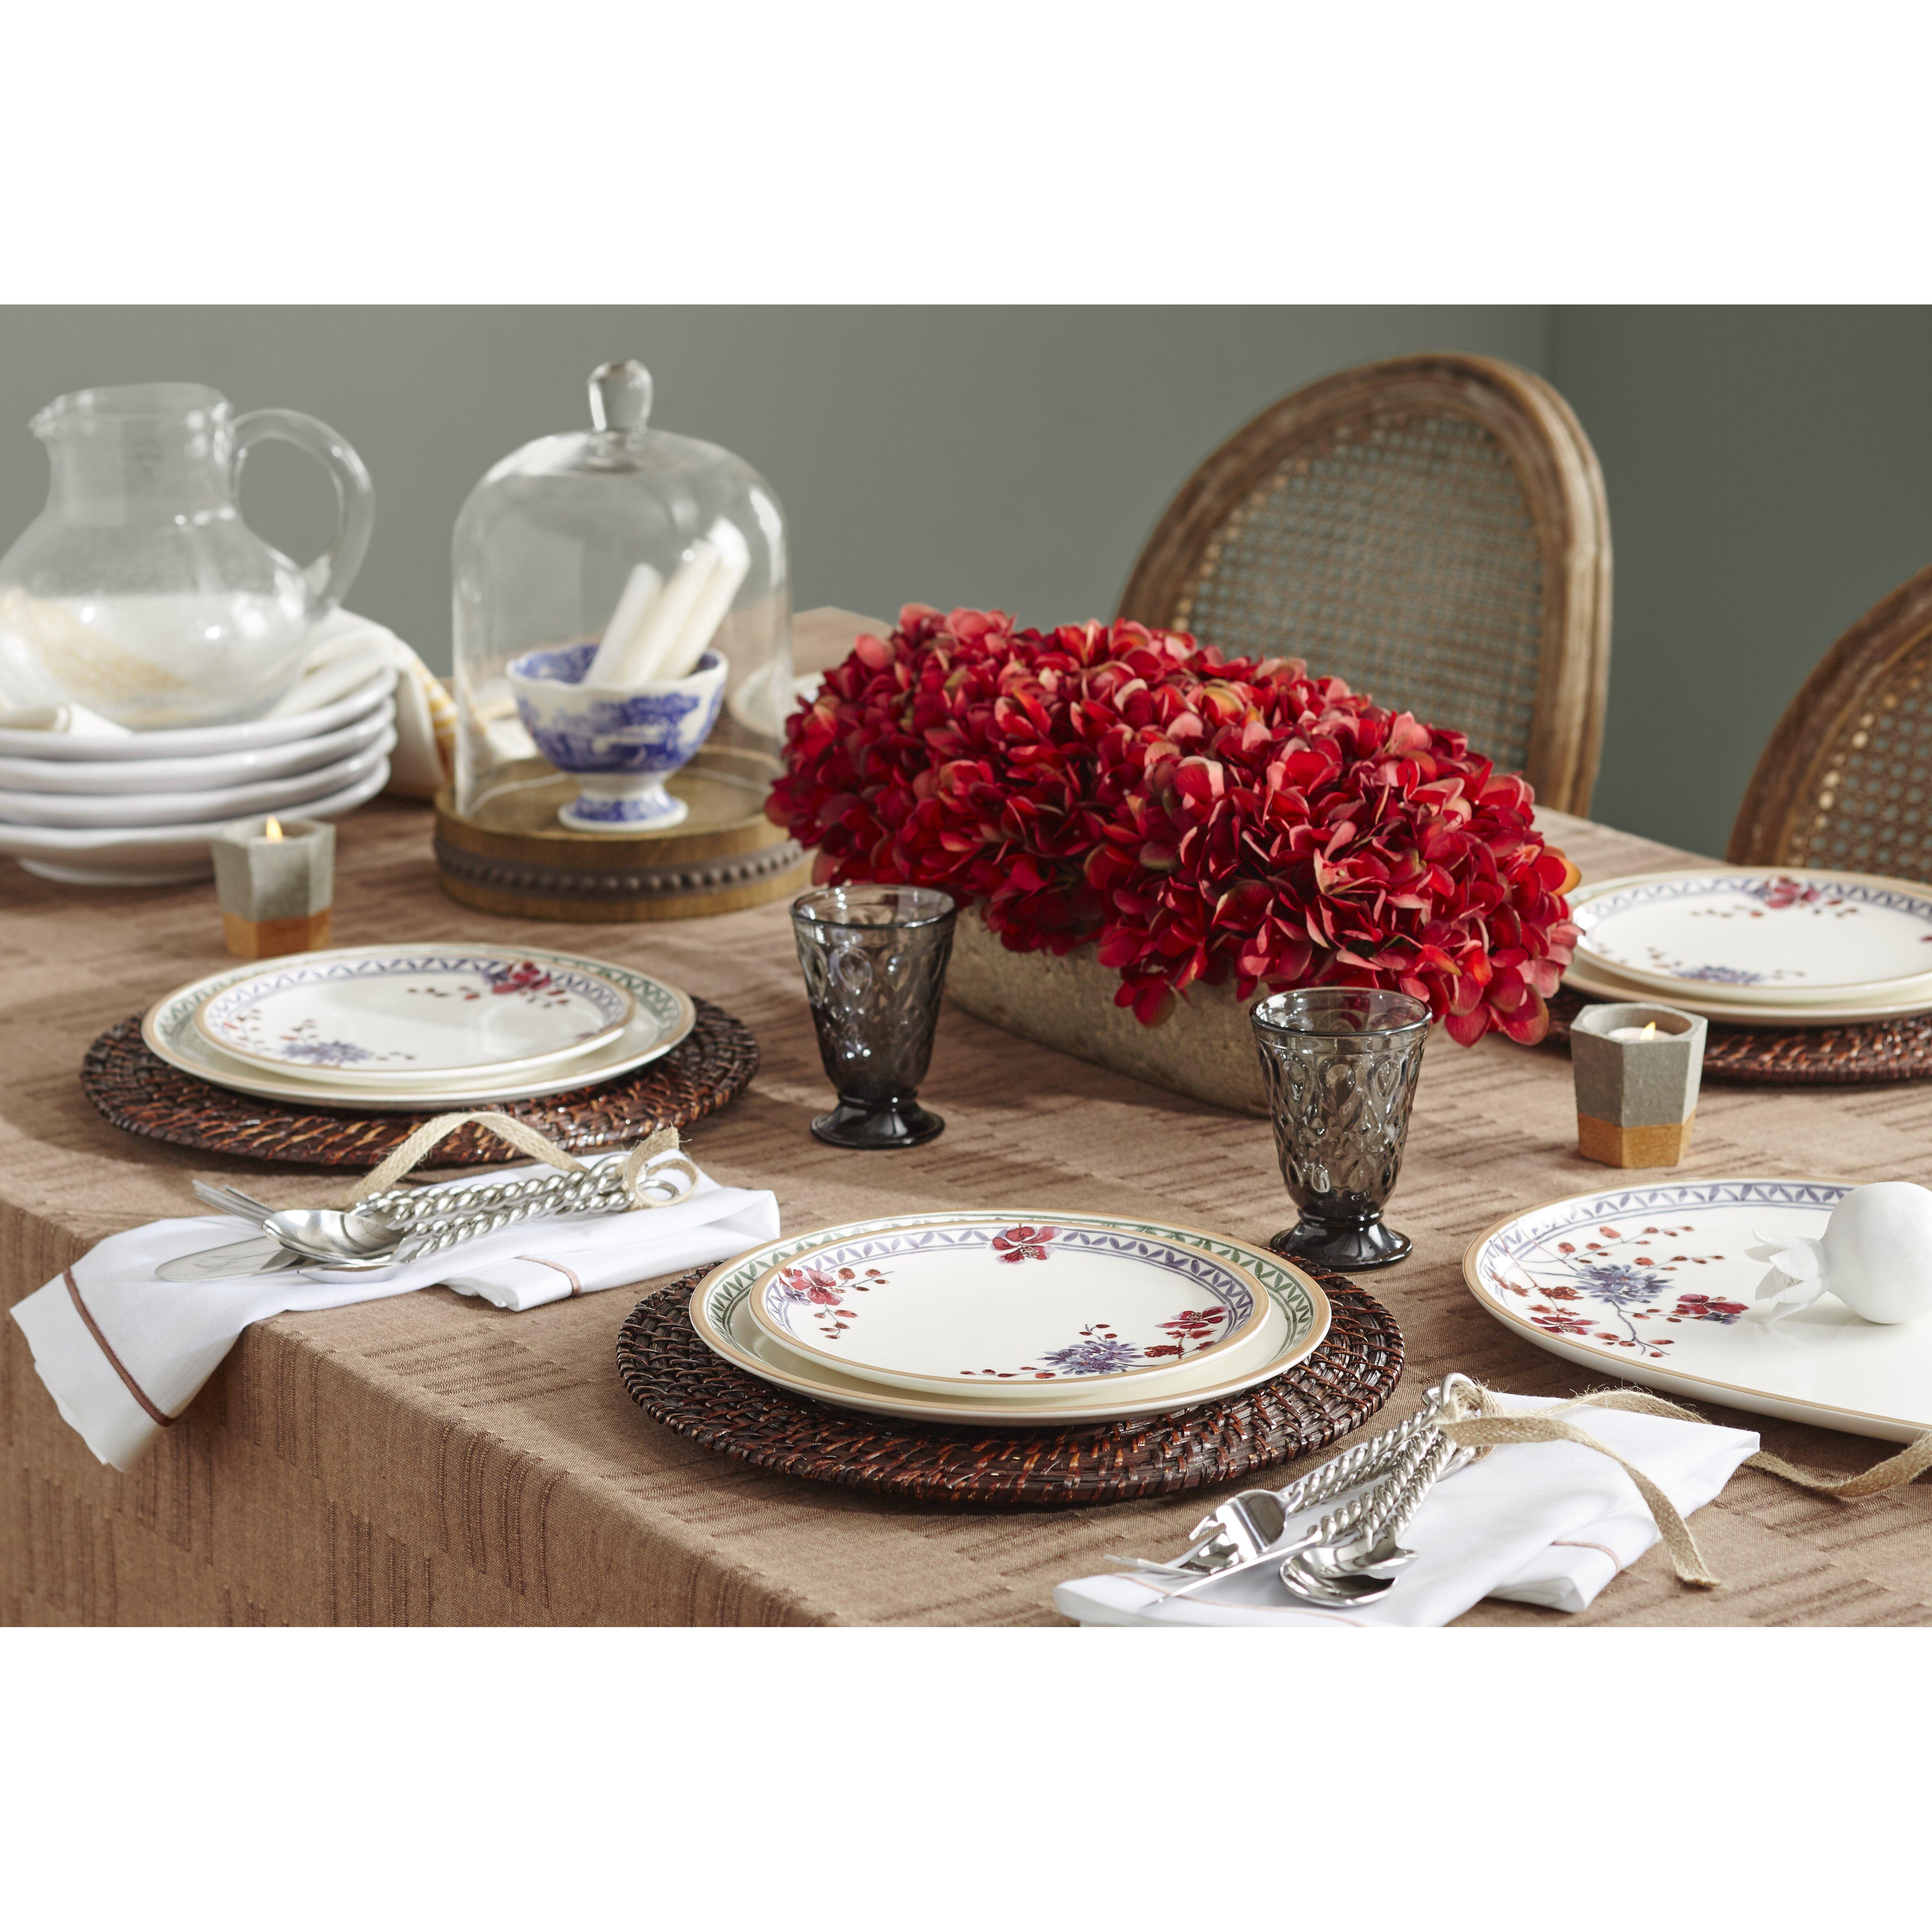 Gourmet settings marina 20 piece flatware set reviews wayfair - Gourmet settings flatware ...